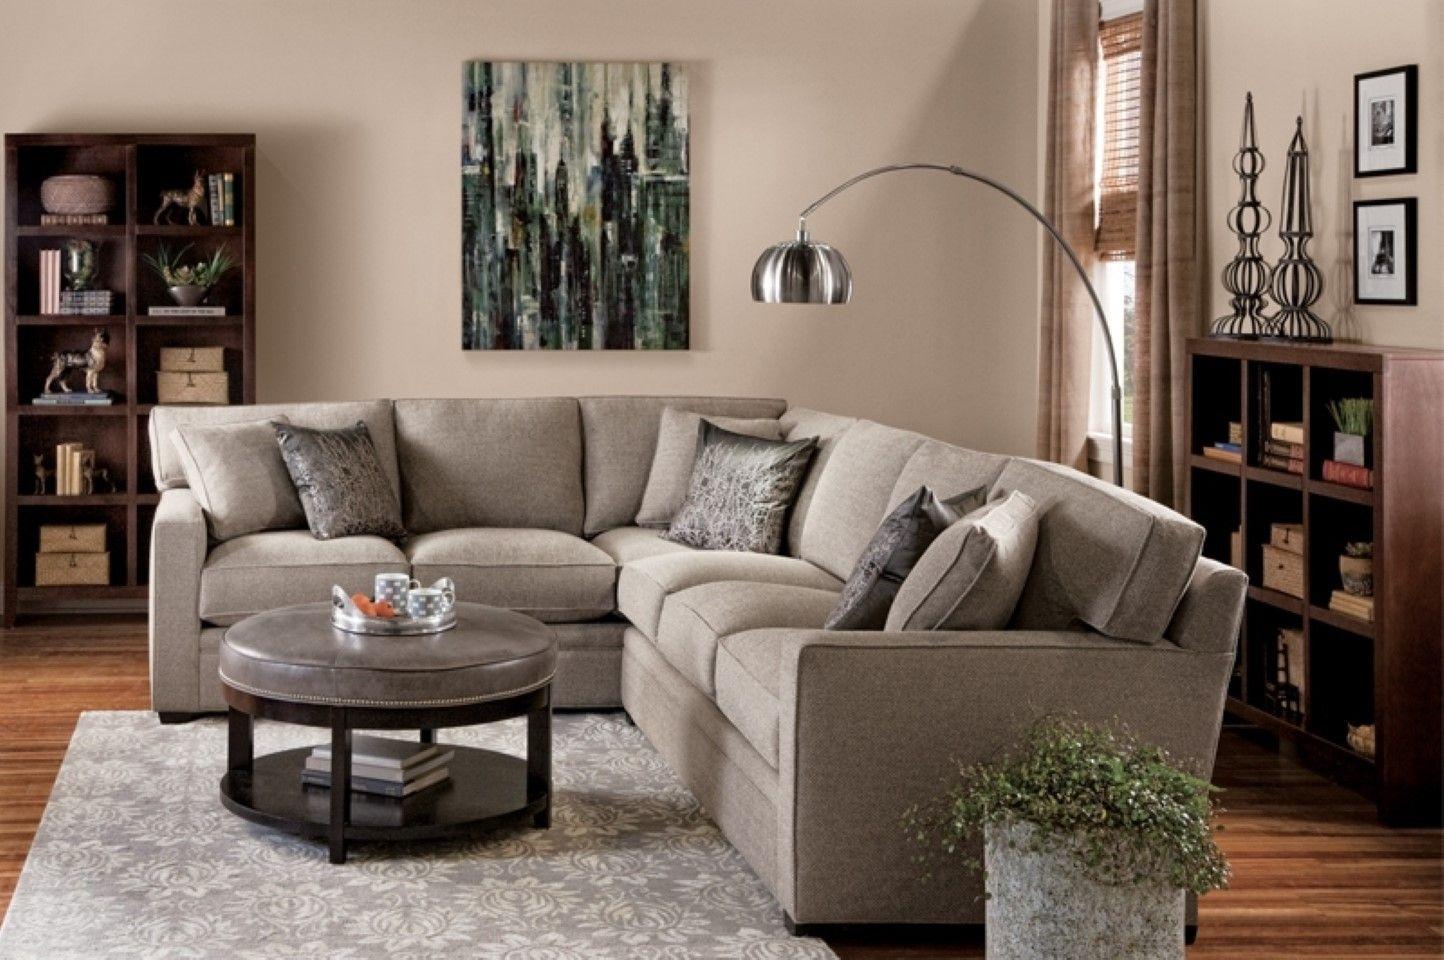 Nice Floor Lamp For Sectional Sofa